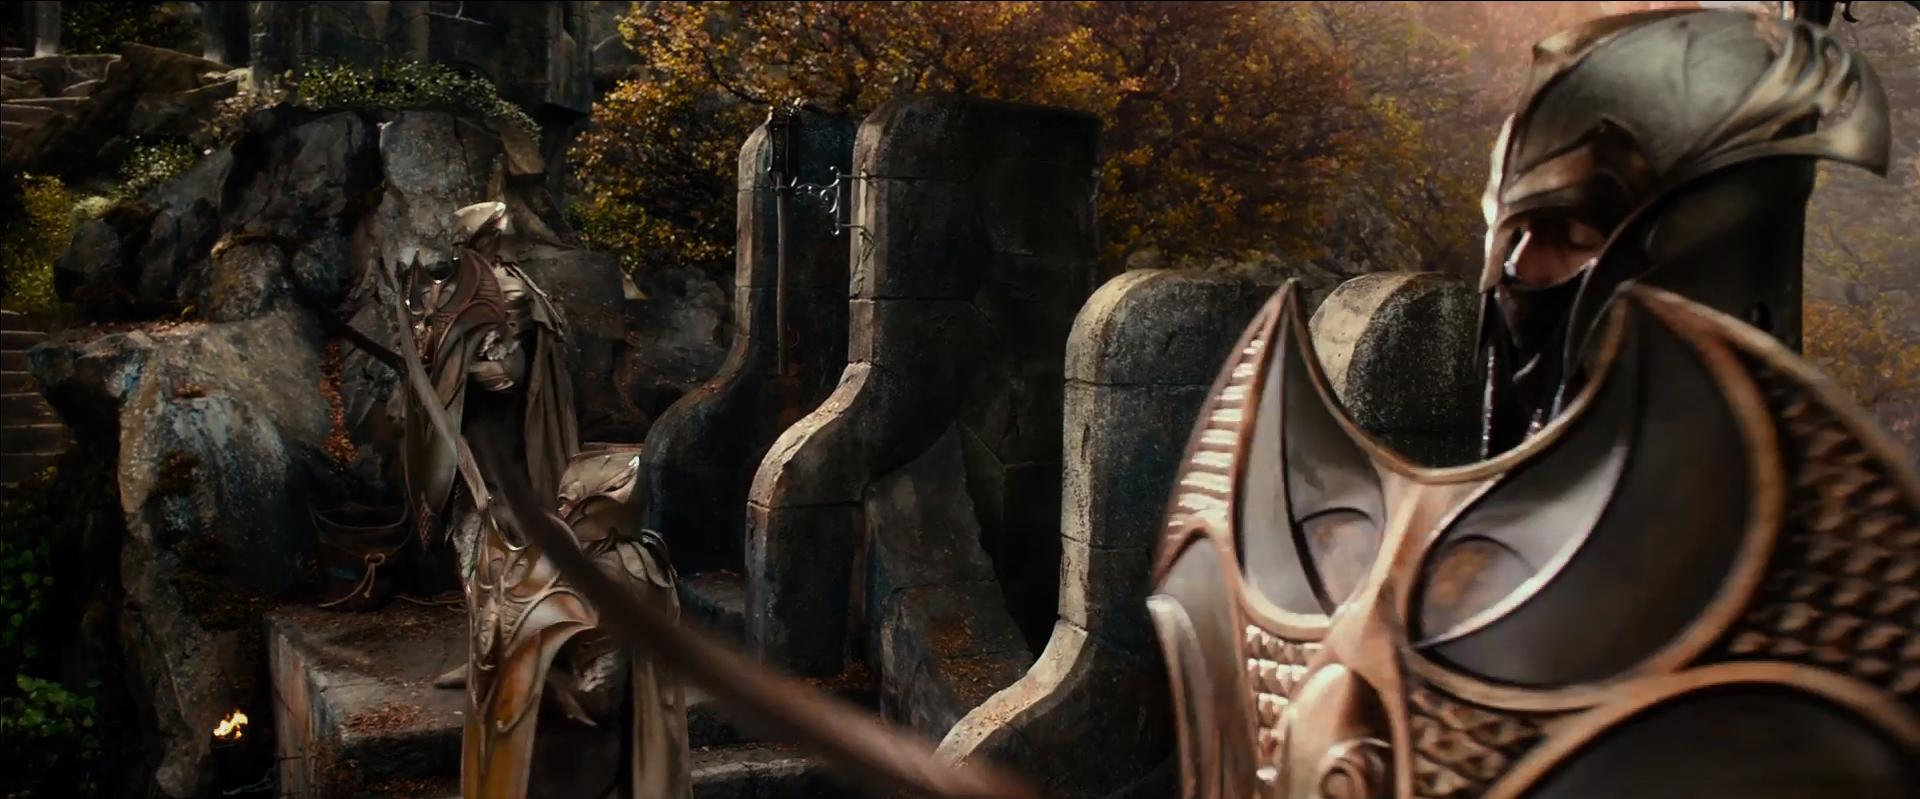 LOTR & The Hobbit 2013 Set Discussion - Page 244 - LEGO